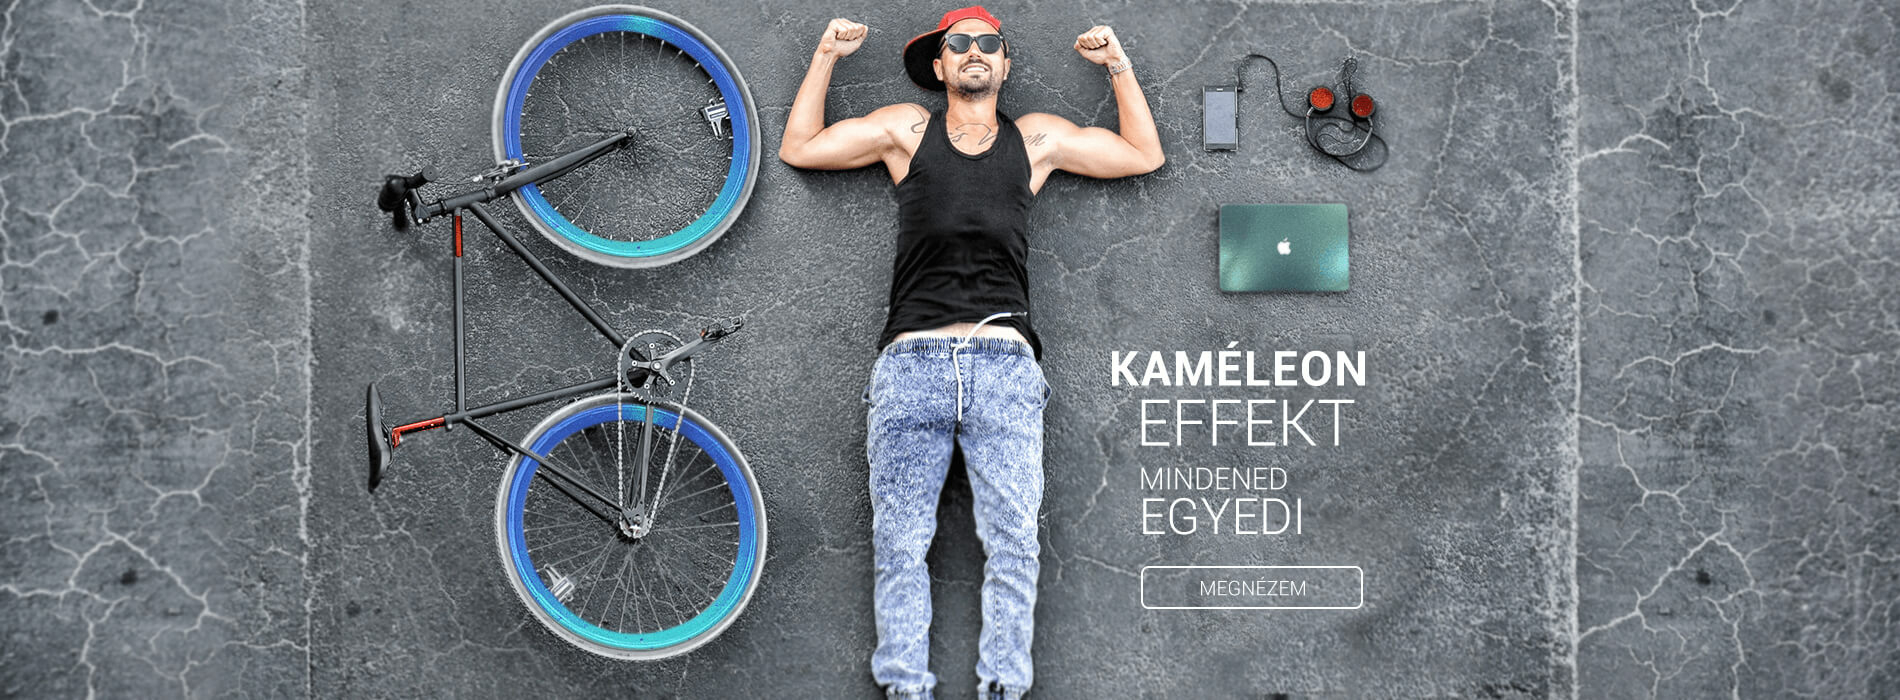 Kaméleon bicikli